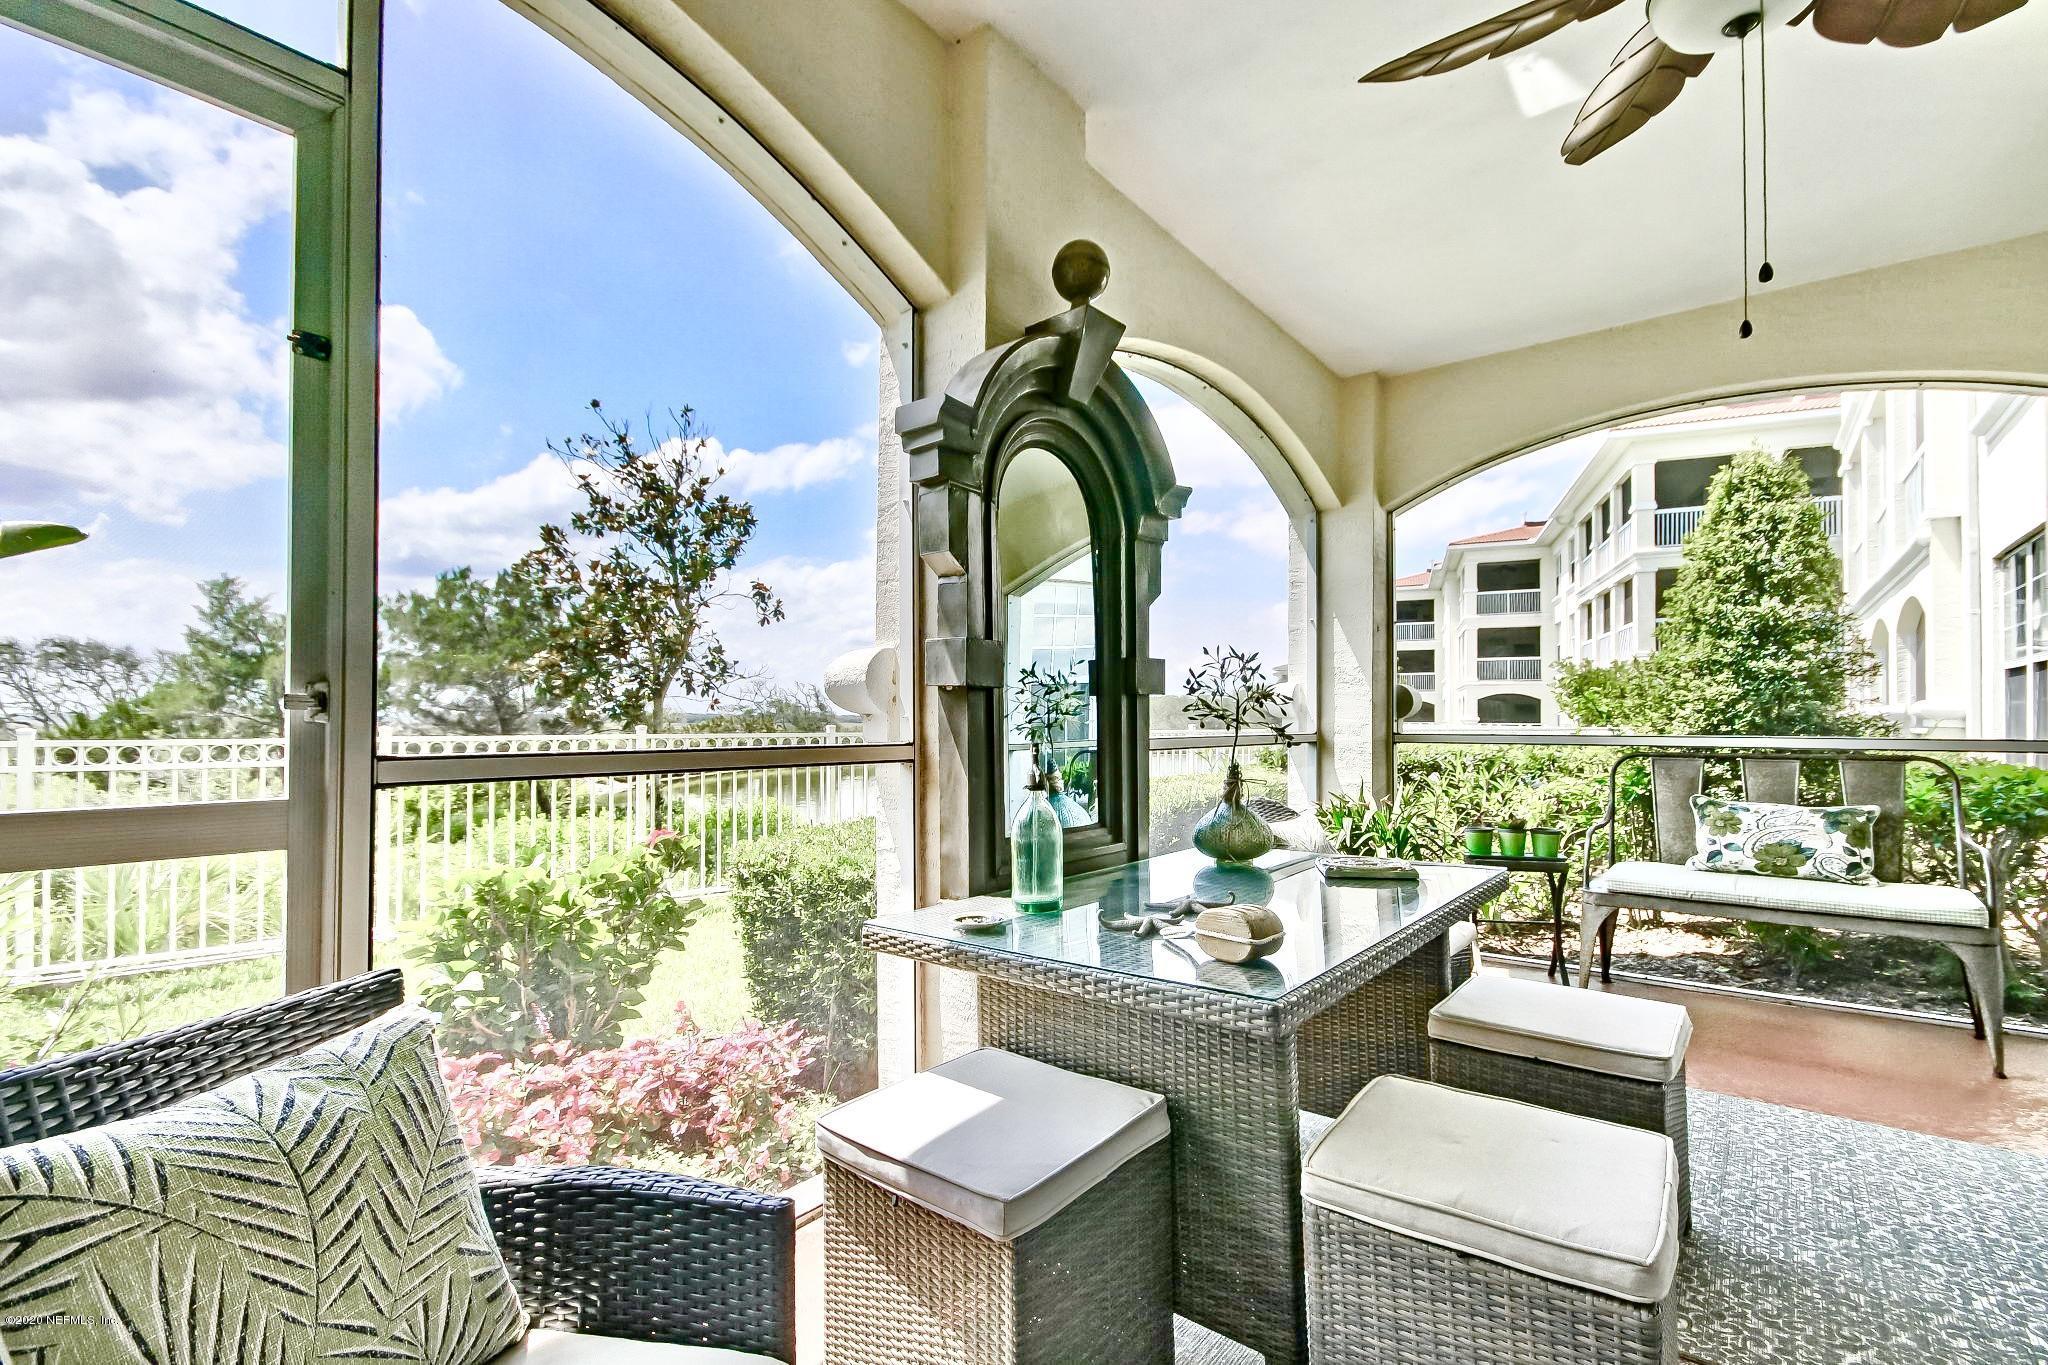 425 OCEAN GRANDE, PONTE VEDRA BEACH, FLORIDA 32082, 3 Bedrooms Bedrooms, ,3 BathroomsBathrooms,Residential,For sale,OCEAN GRANDE,1055437